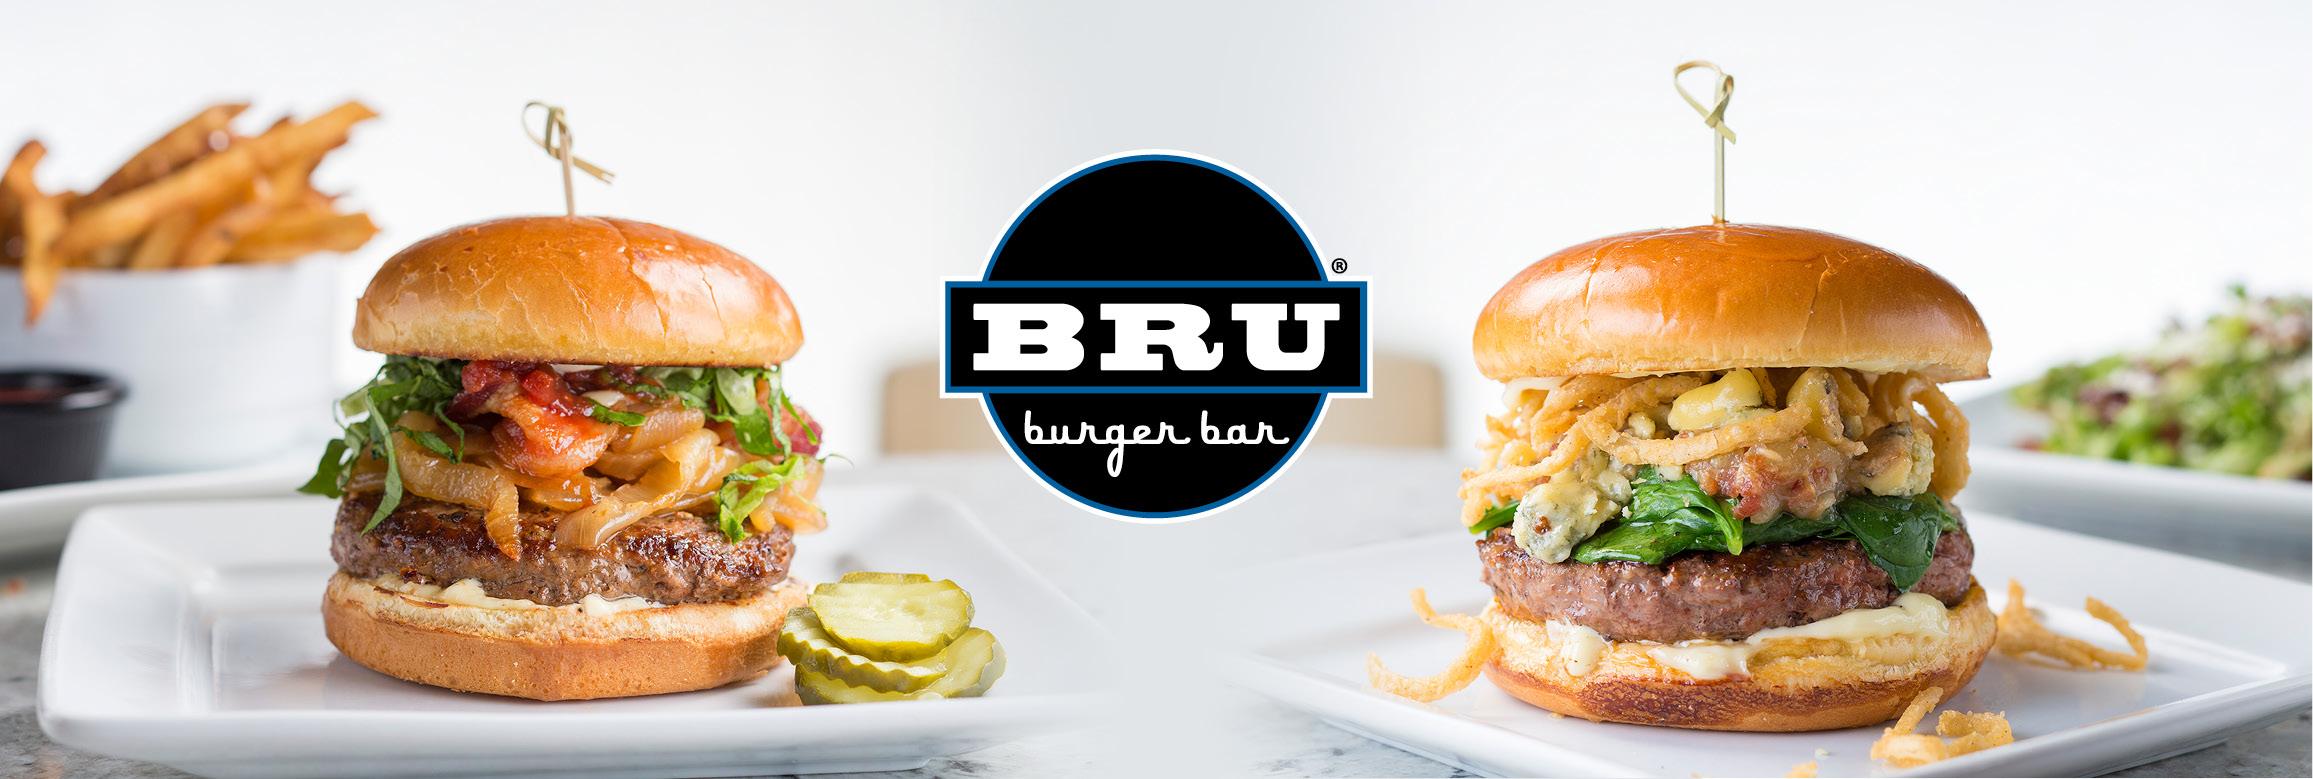 Bru Burger Bar Reviews, Ratings   Restaurants near 222 Sycamore St , Evansville IN